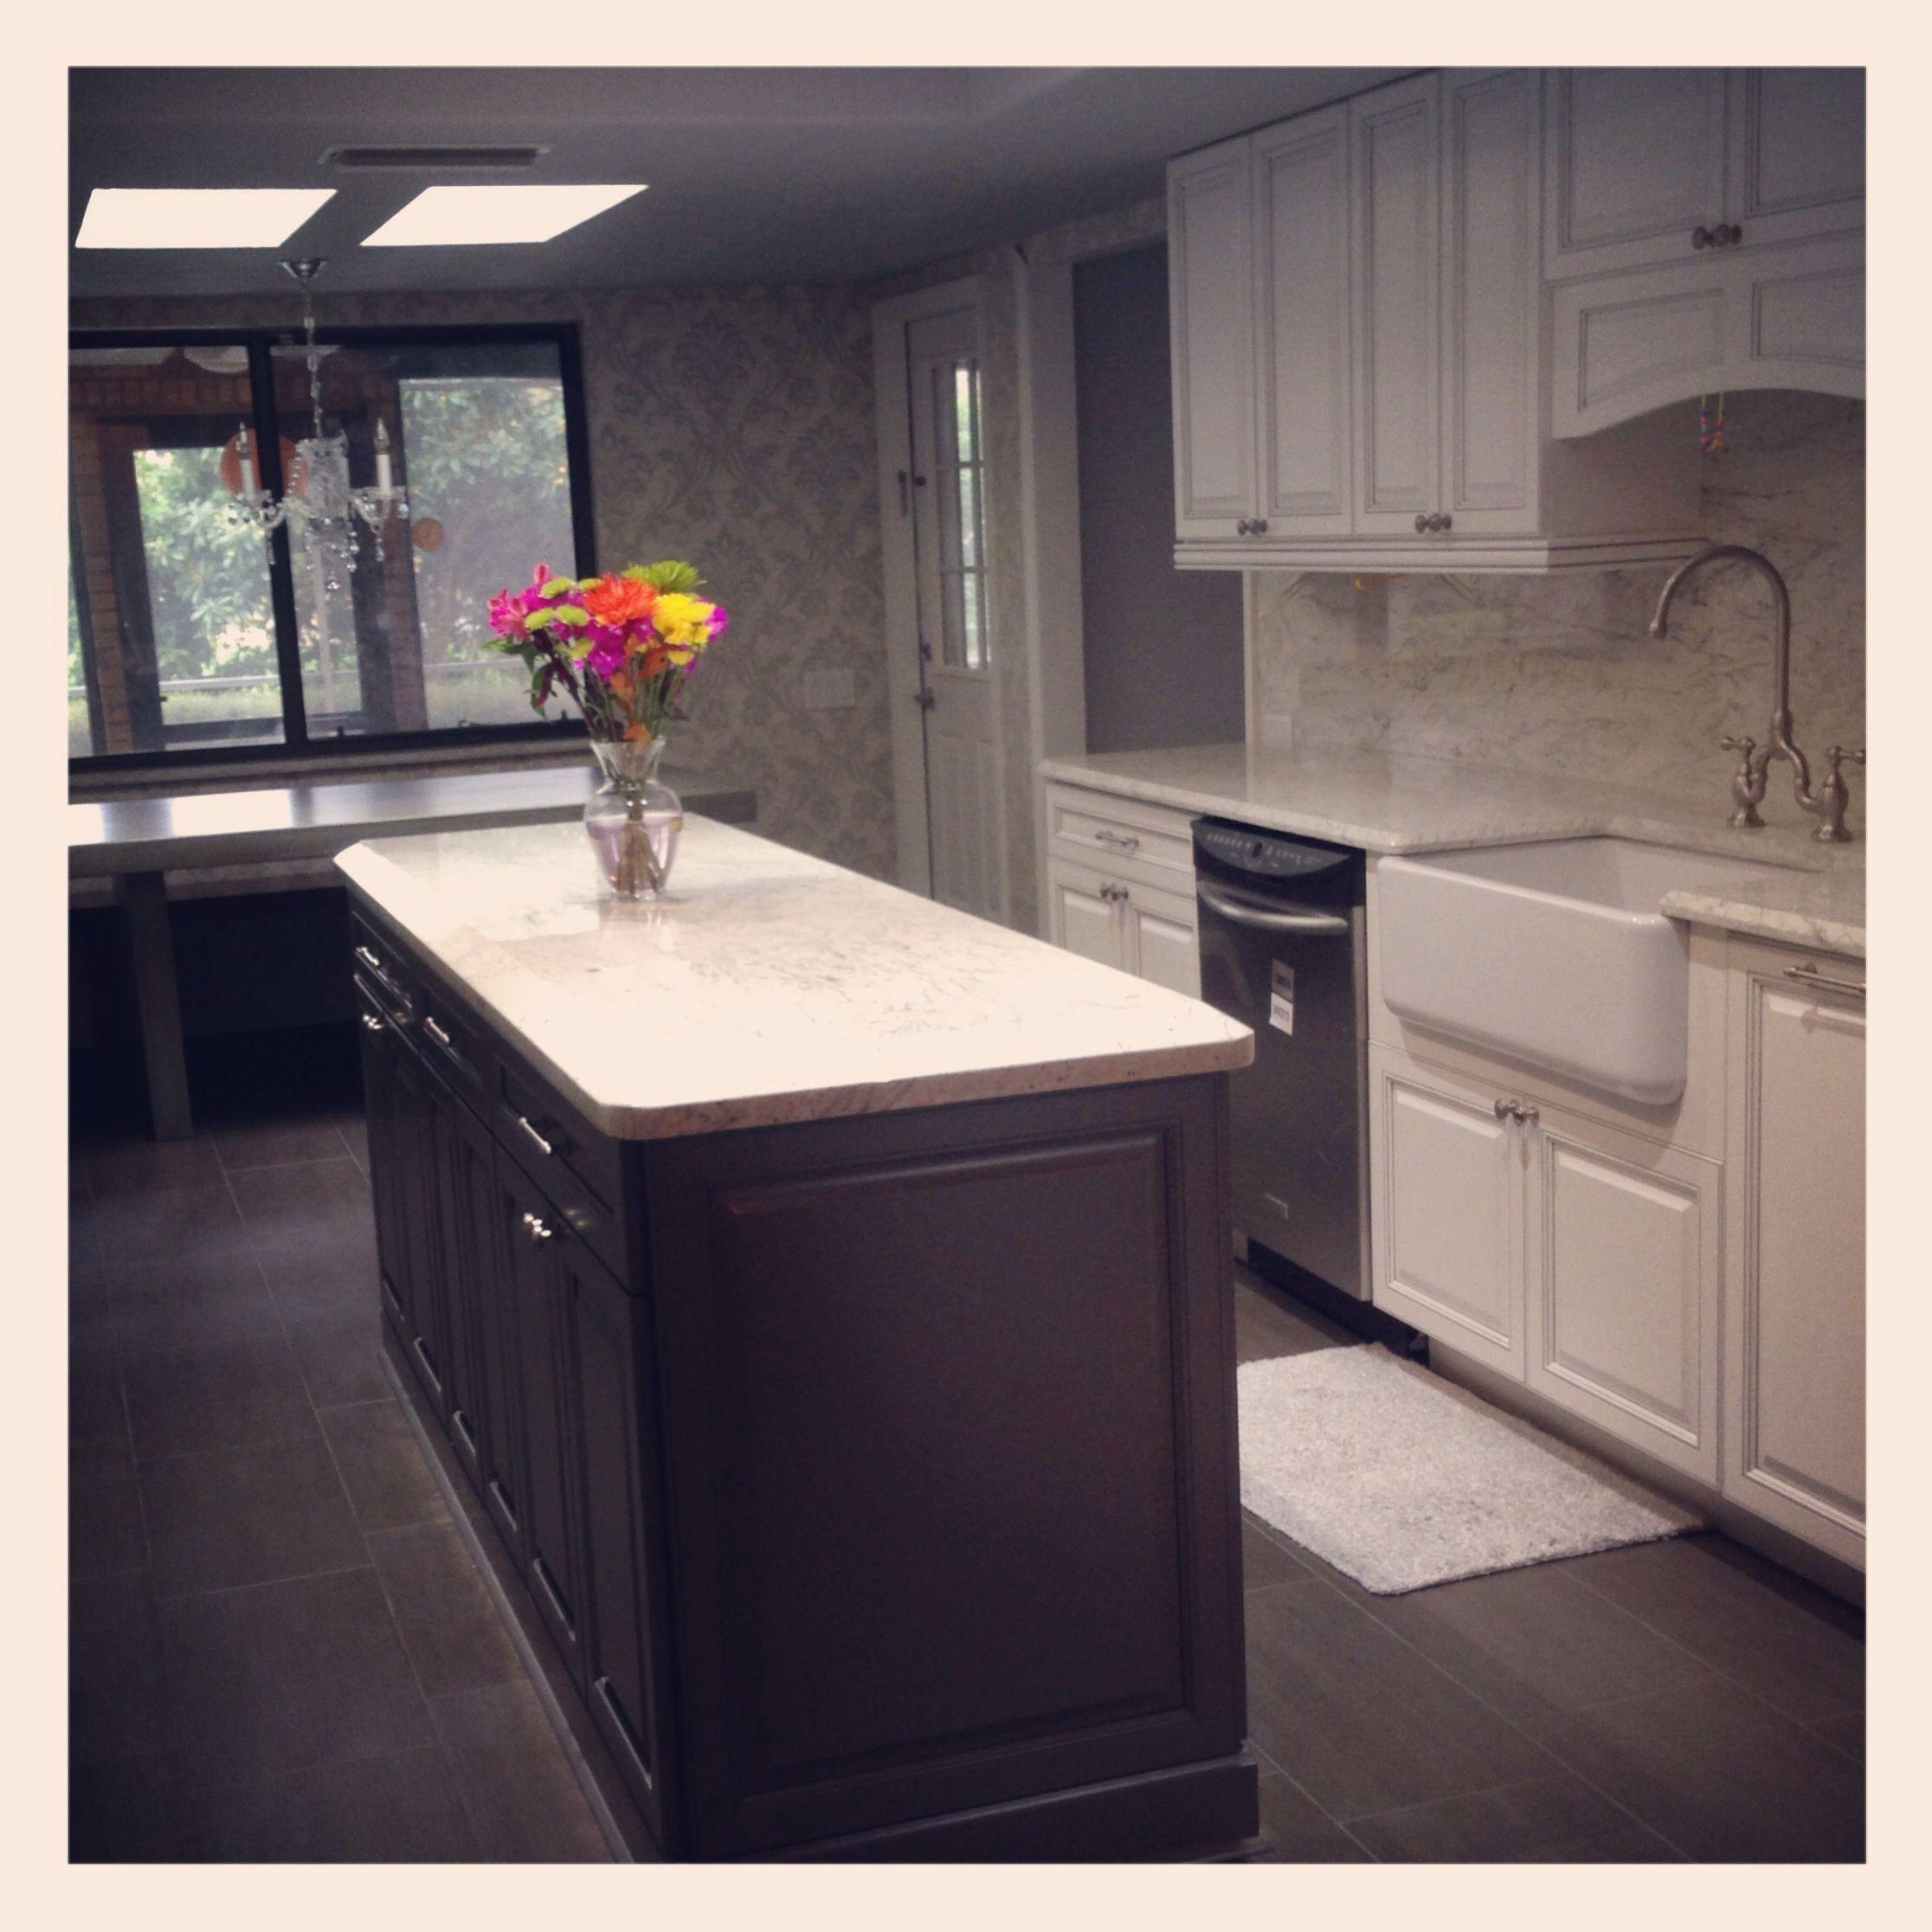 Pin By Erin Haley On Home River White Granite White Granite Kitchen